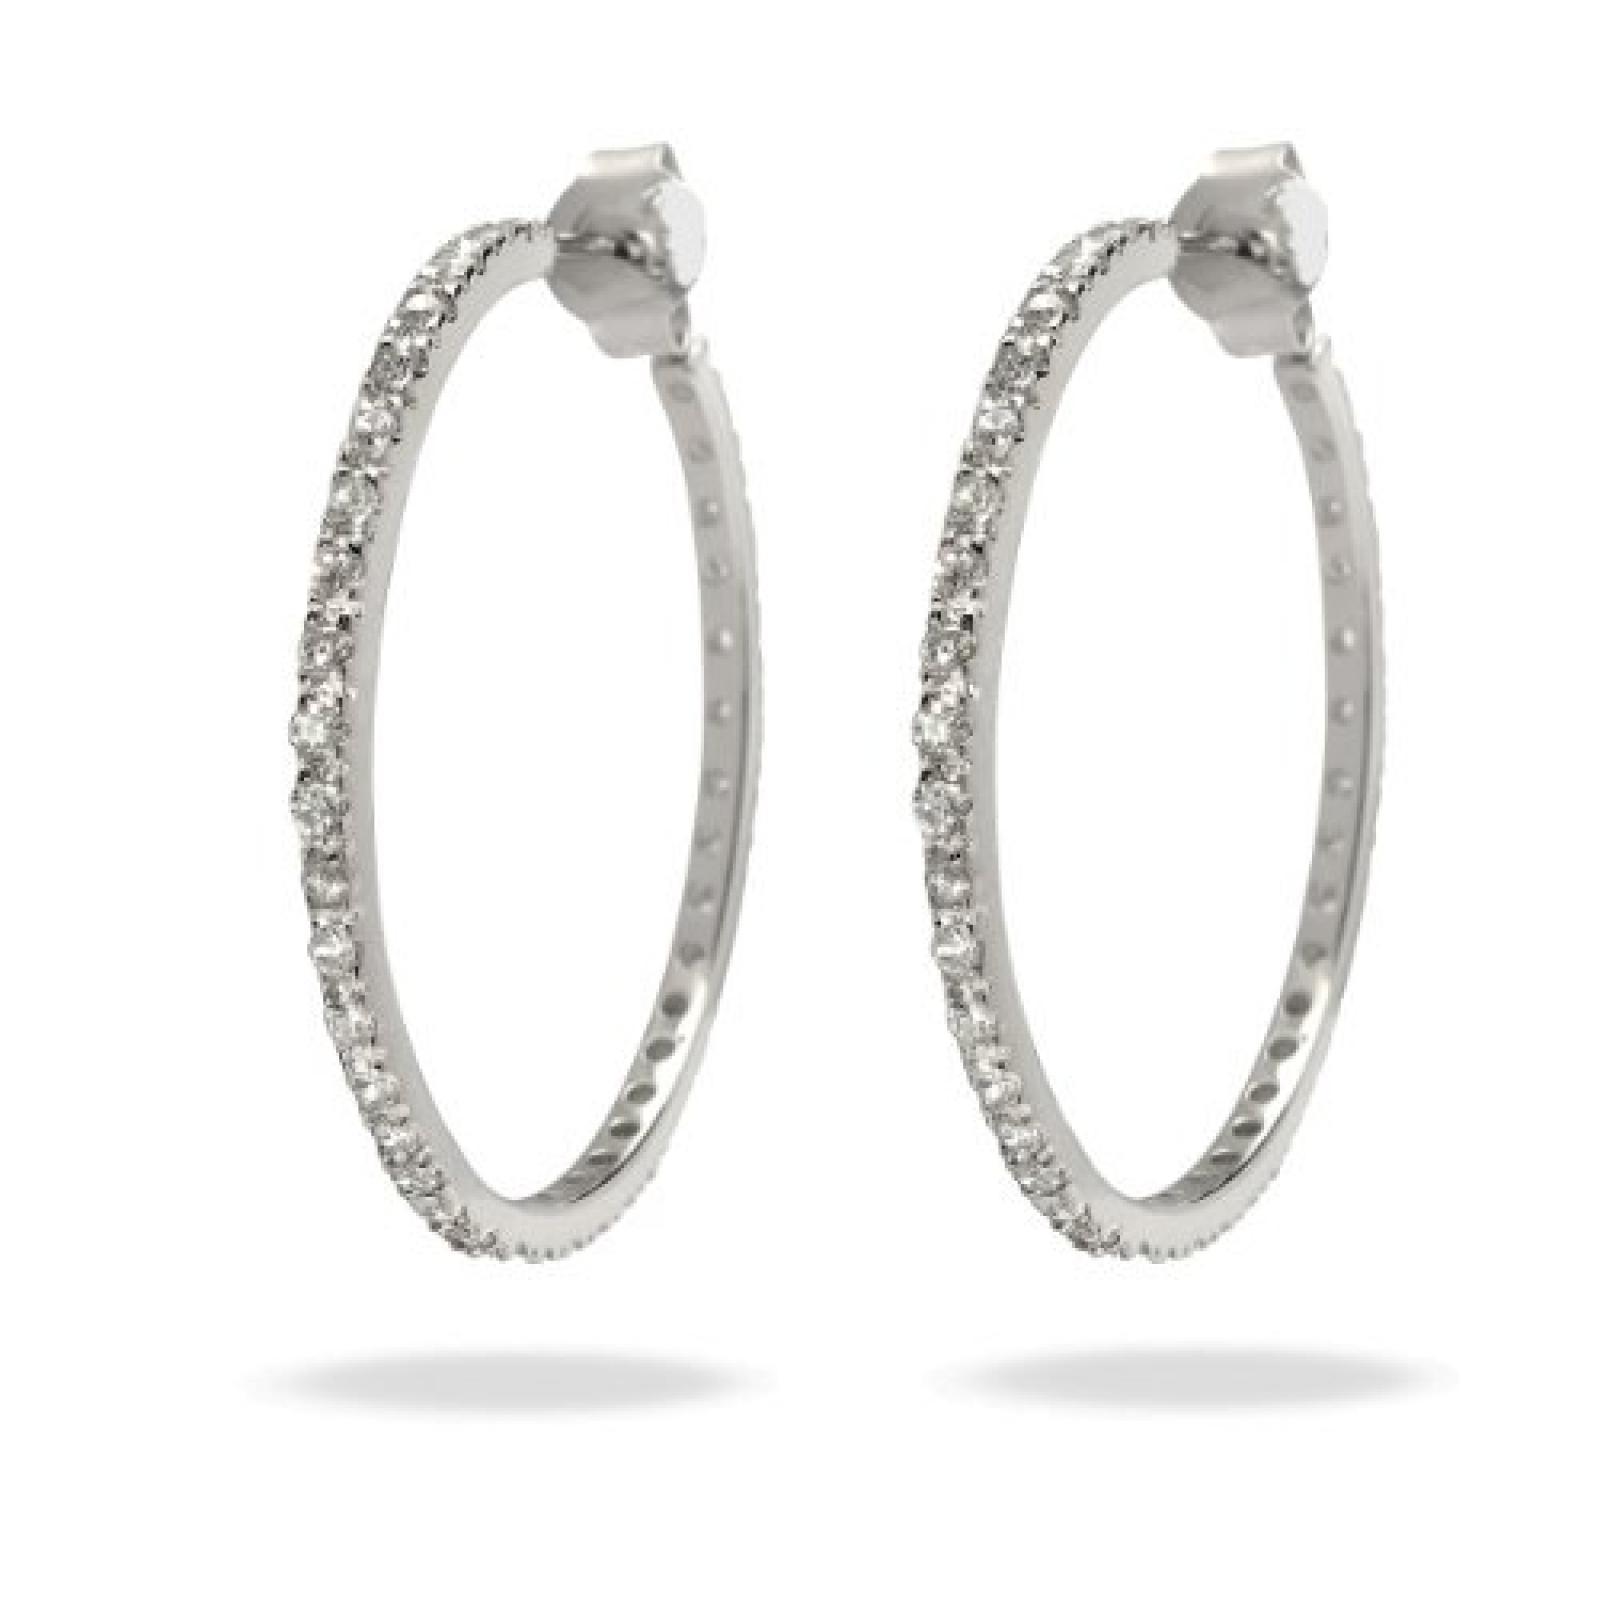 Rafaela Donata Glamour Collection Damen-Creolen 925 Sterling Silber Zirkonia weiß  60832006